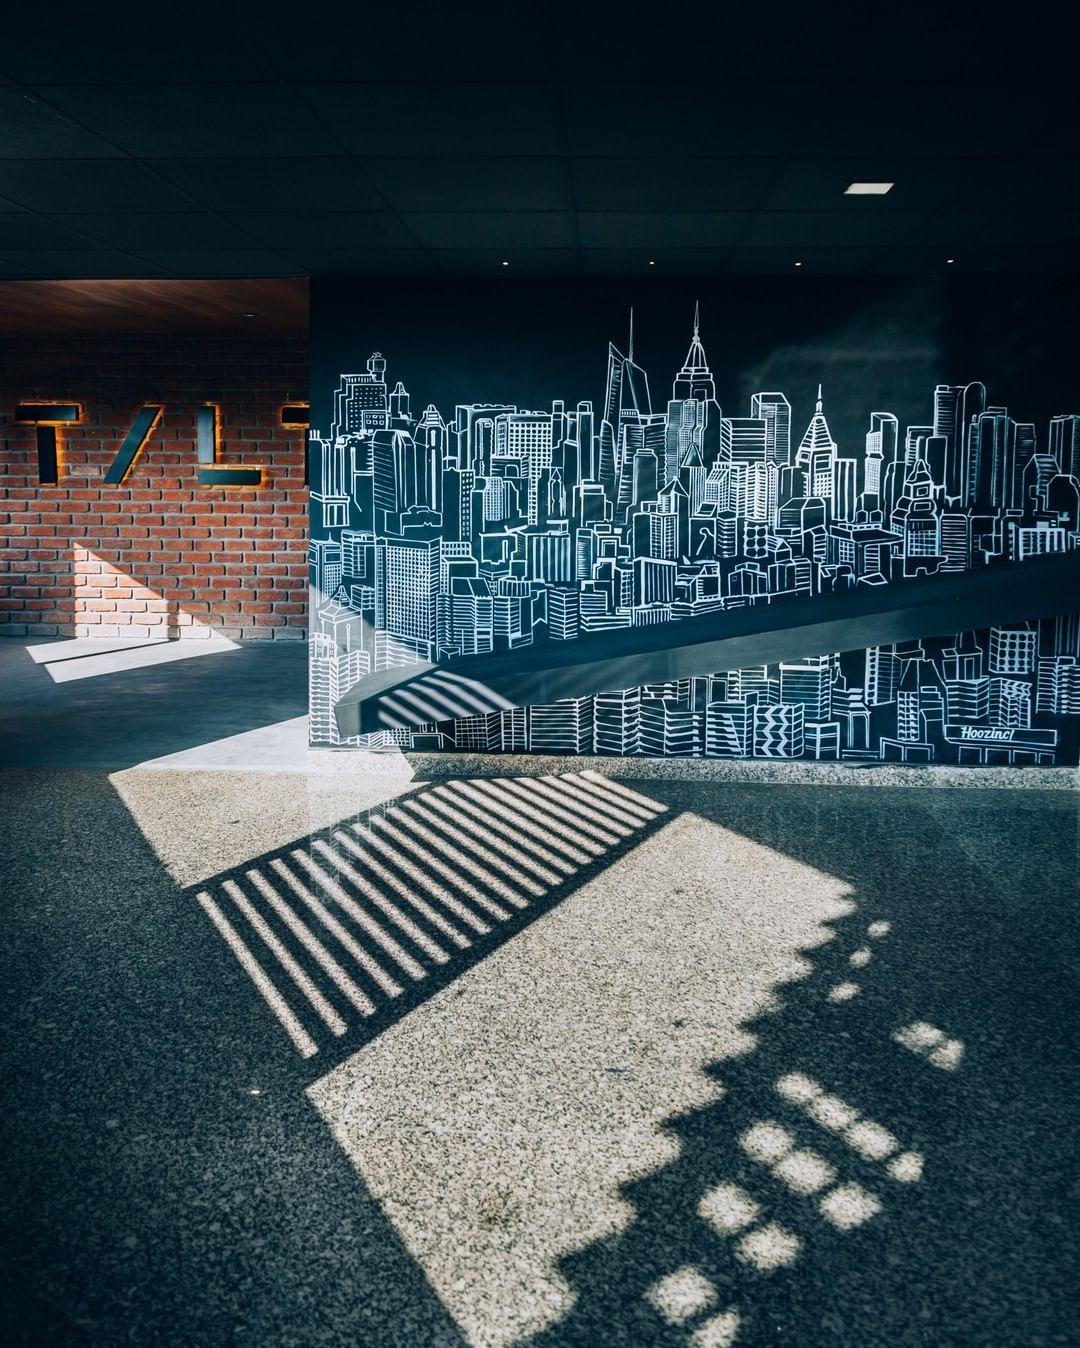 For a city that shines, here is a shower of gold! ⠀⠀⠀⠀⠀⠀⠀⠀⠀ .⠀⠀⠀⠀⠀⠀⠀⠀⠀ .⠀⠀⠀⠀⠀⠀⠀⠀⠀ .⠀⠀⠀⠀⠀⠀⠀⠀⠀ .⠀⠀⠀⠀⠀⠀⠀⠀⠀ . #decordetails #decorgoals #decortrends #decortips #decorindia #interiorstyles⠀⠀⠀⠀⠀⠀⠀⠀⠀ #interiordesignersofinstagram #interiorspace #livingroomdesign #inspirationaldesign #designmagazine #designstyle #designtrends #interiorblog⠀⠀⠀⠀⠀⠀⠀⠀⠀ #decor #decordesign #thedelightofdecor #prettylittleinteriors #decodram